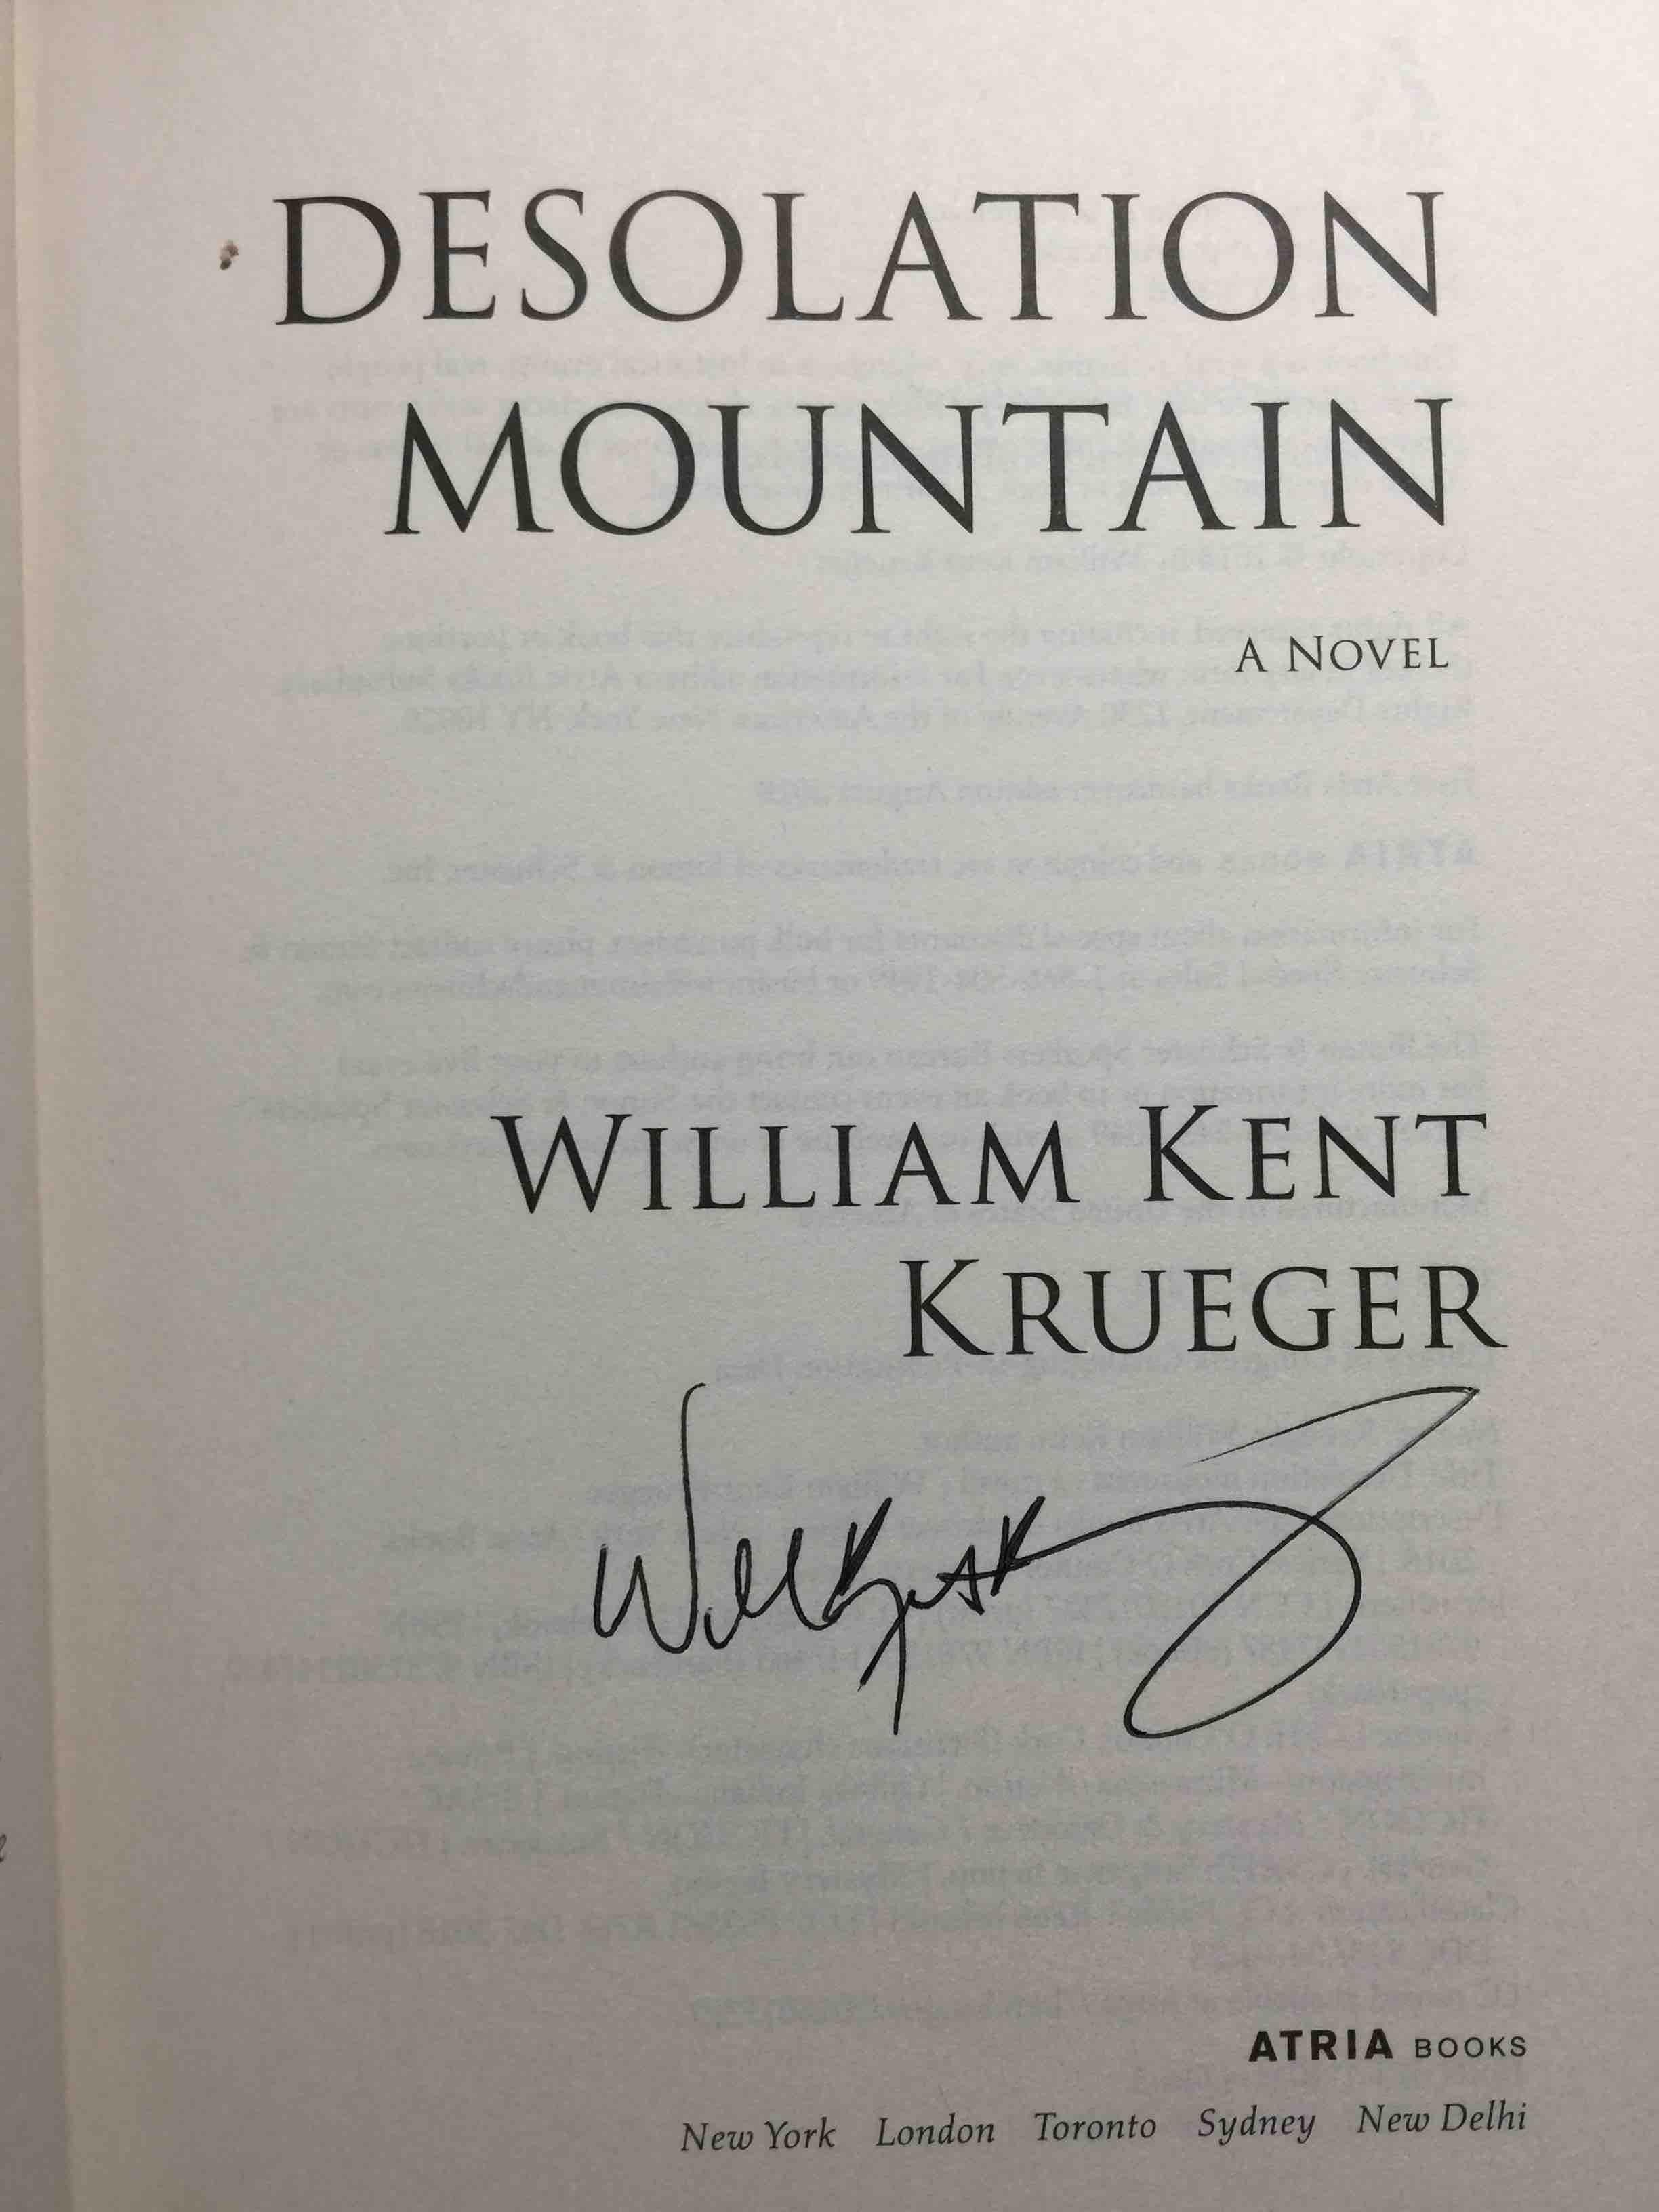 KRUEGER, WILLIAM KENT. - DESOLATION MOUNTAIN.